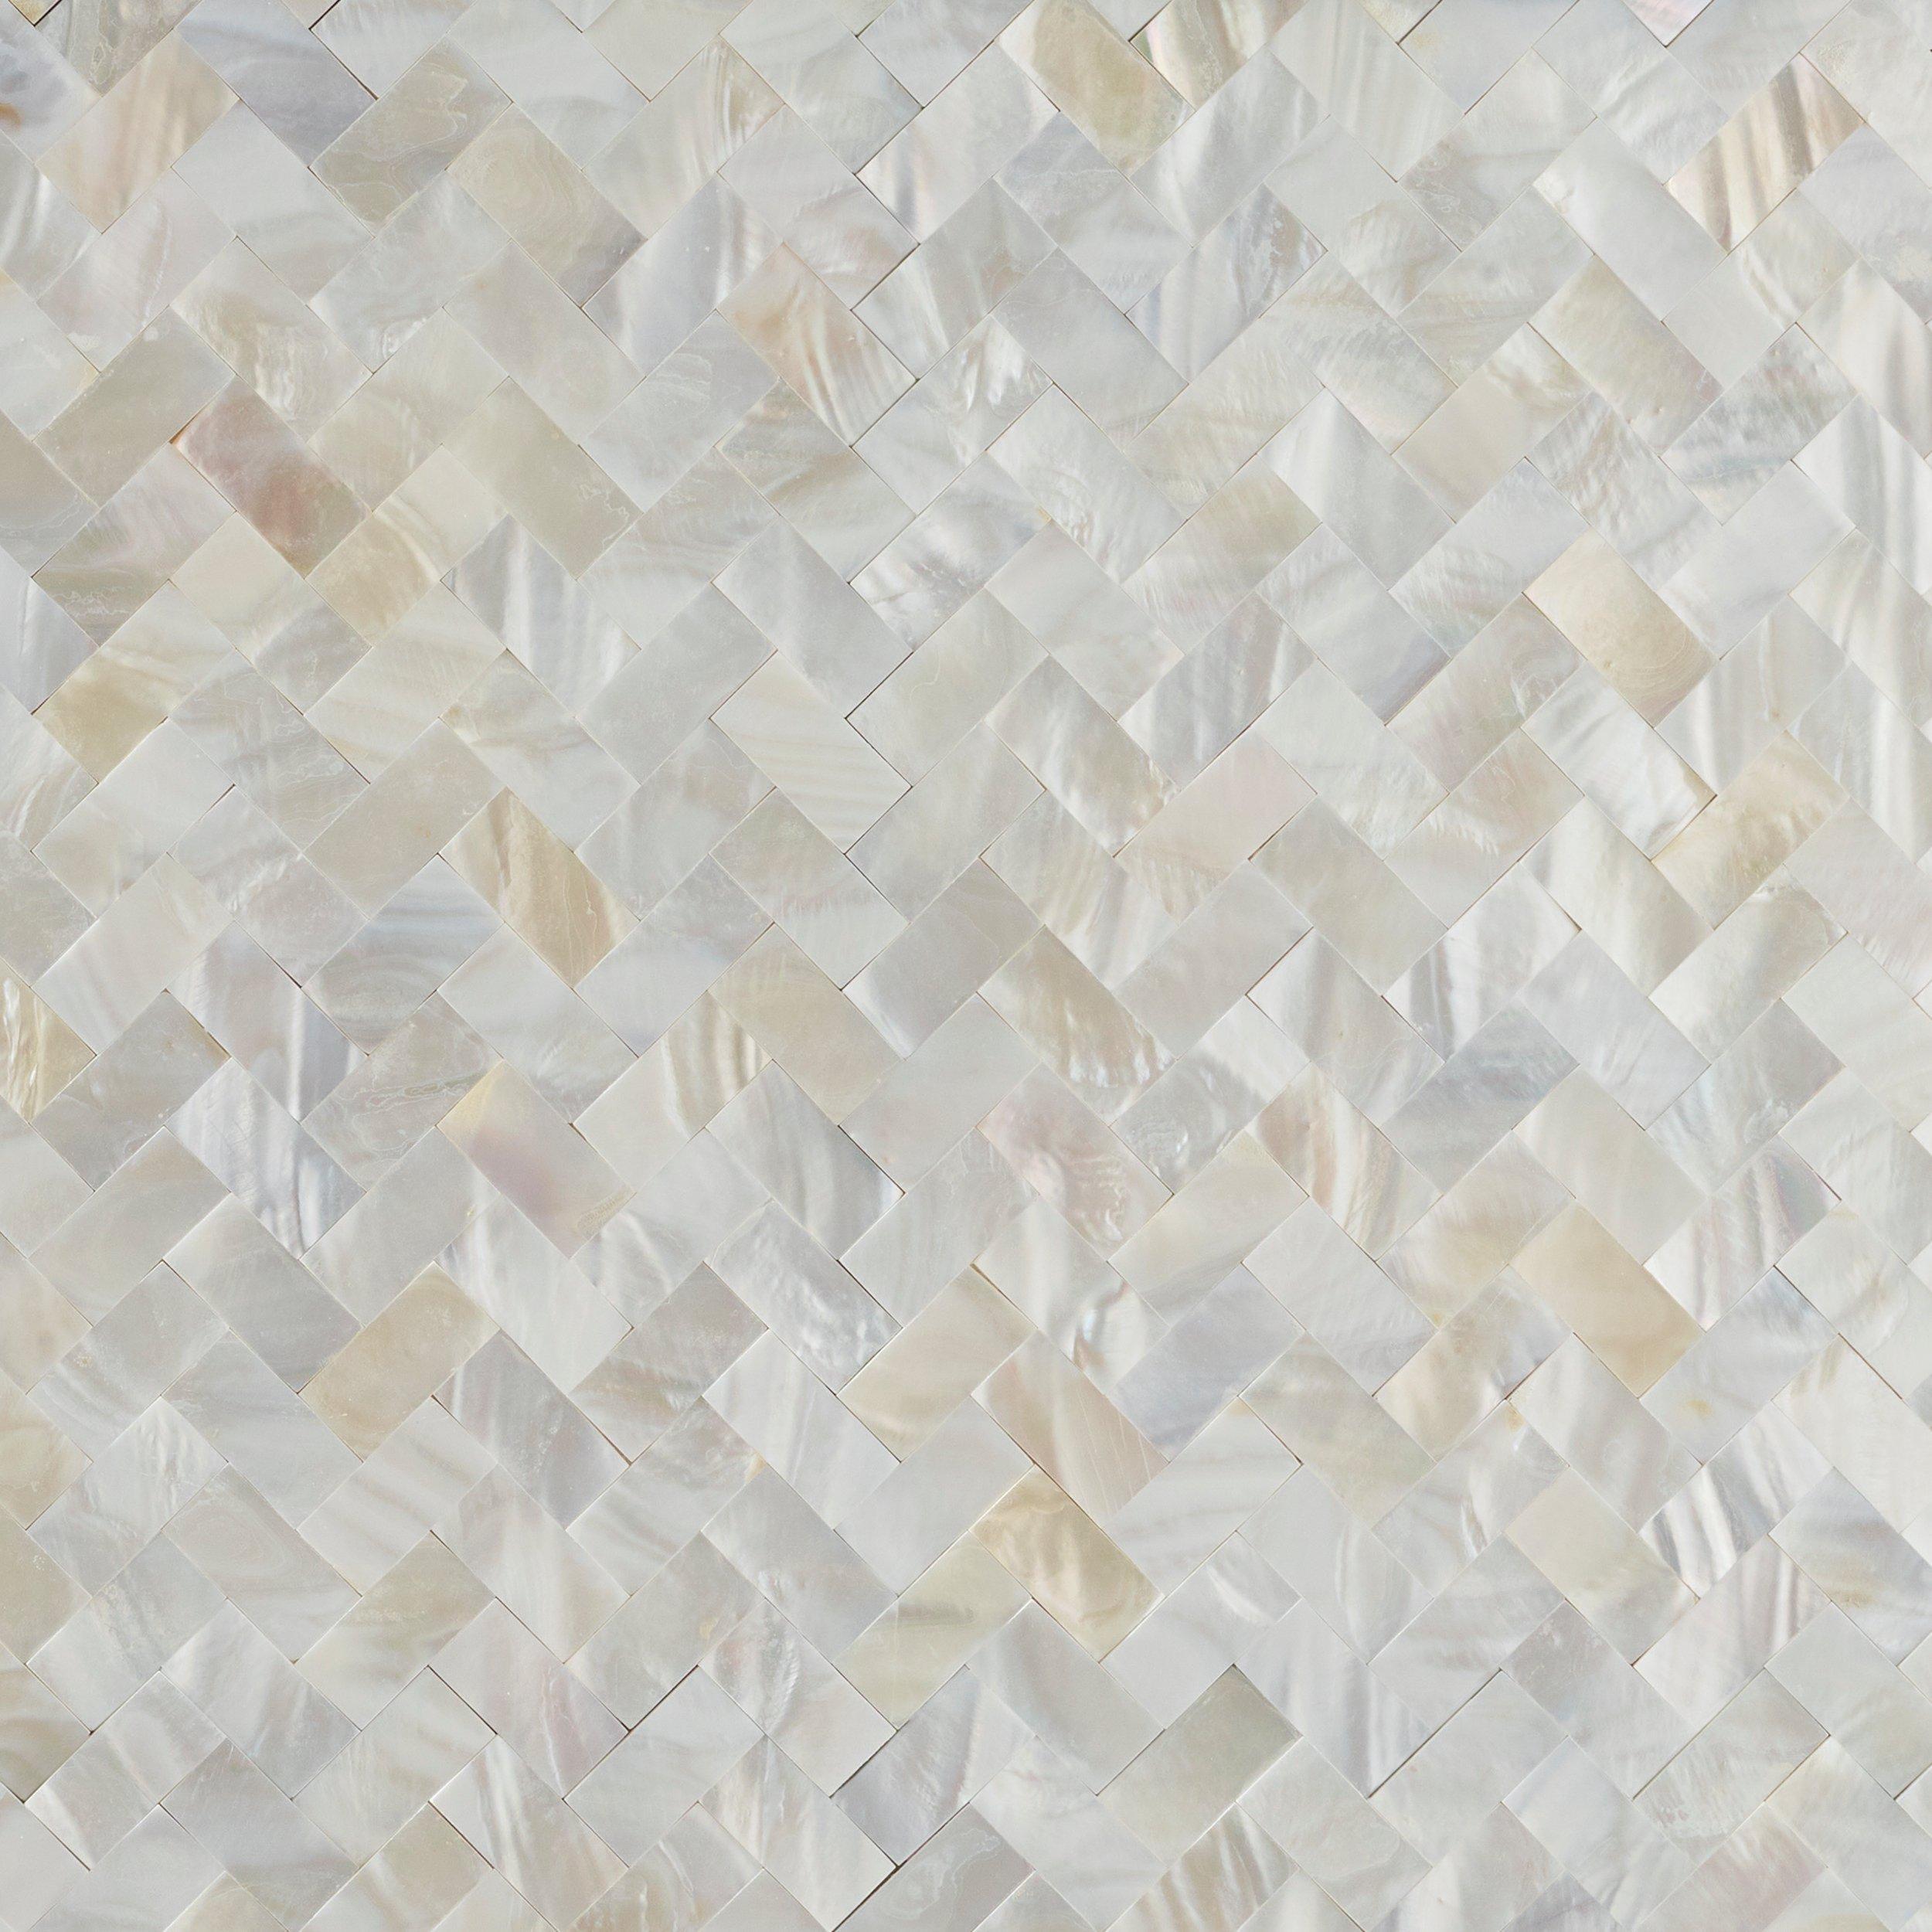 mother of pearl marble herringbone peel and stick tile